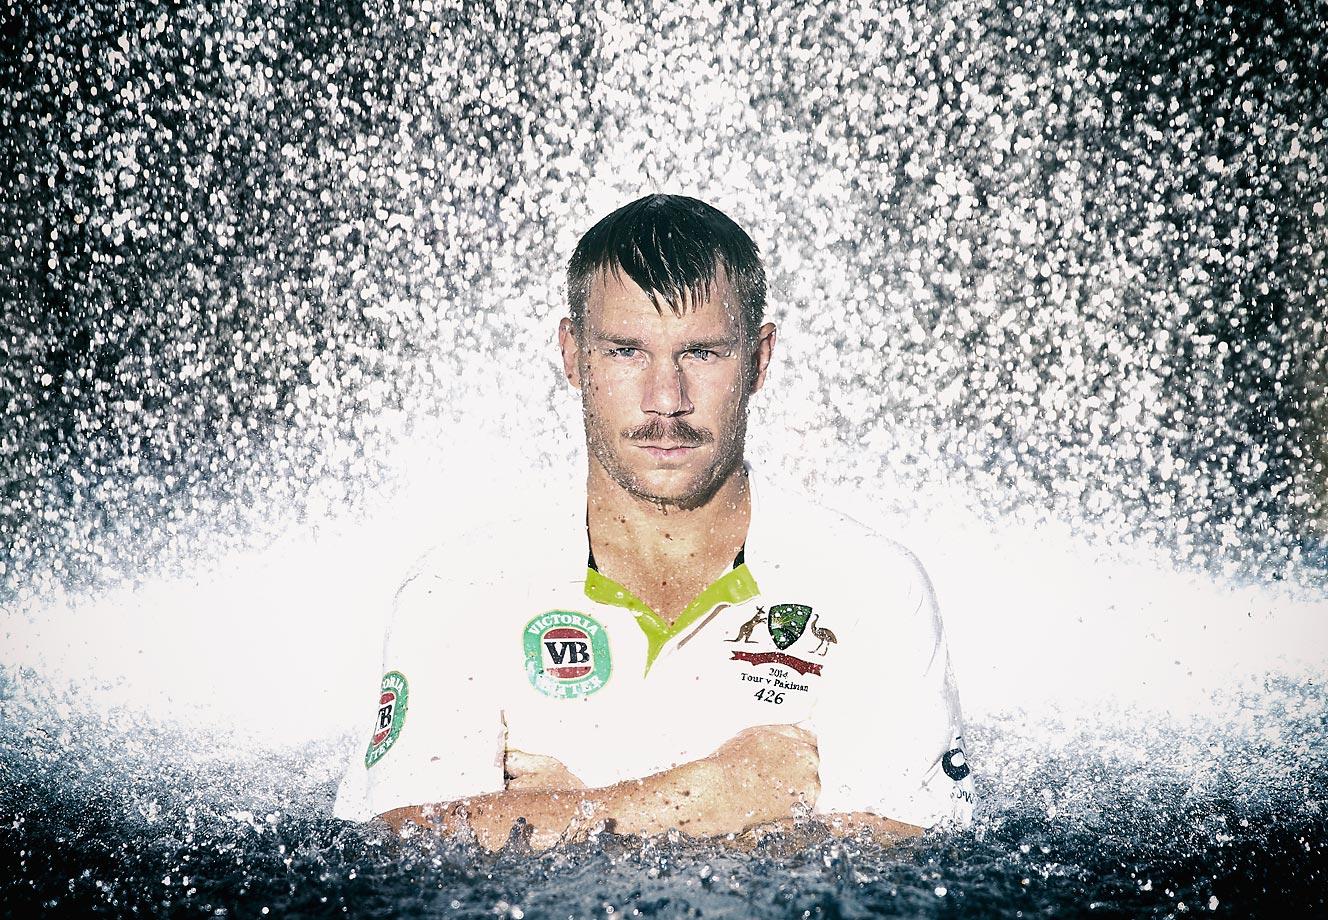 David Warner of Australia poses during the Australian Cricket Team portrait day.